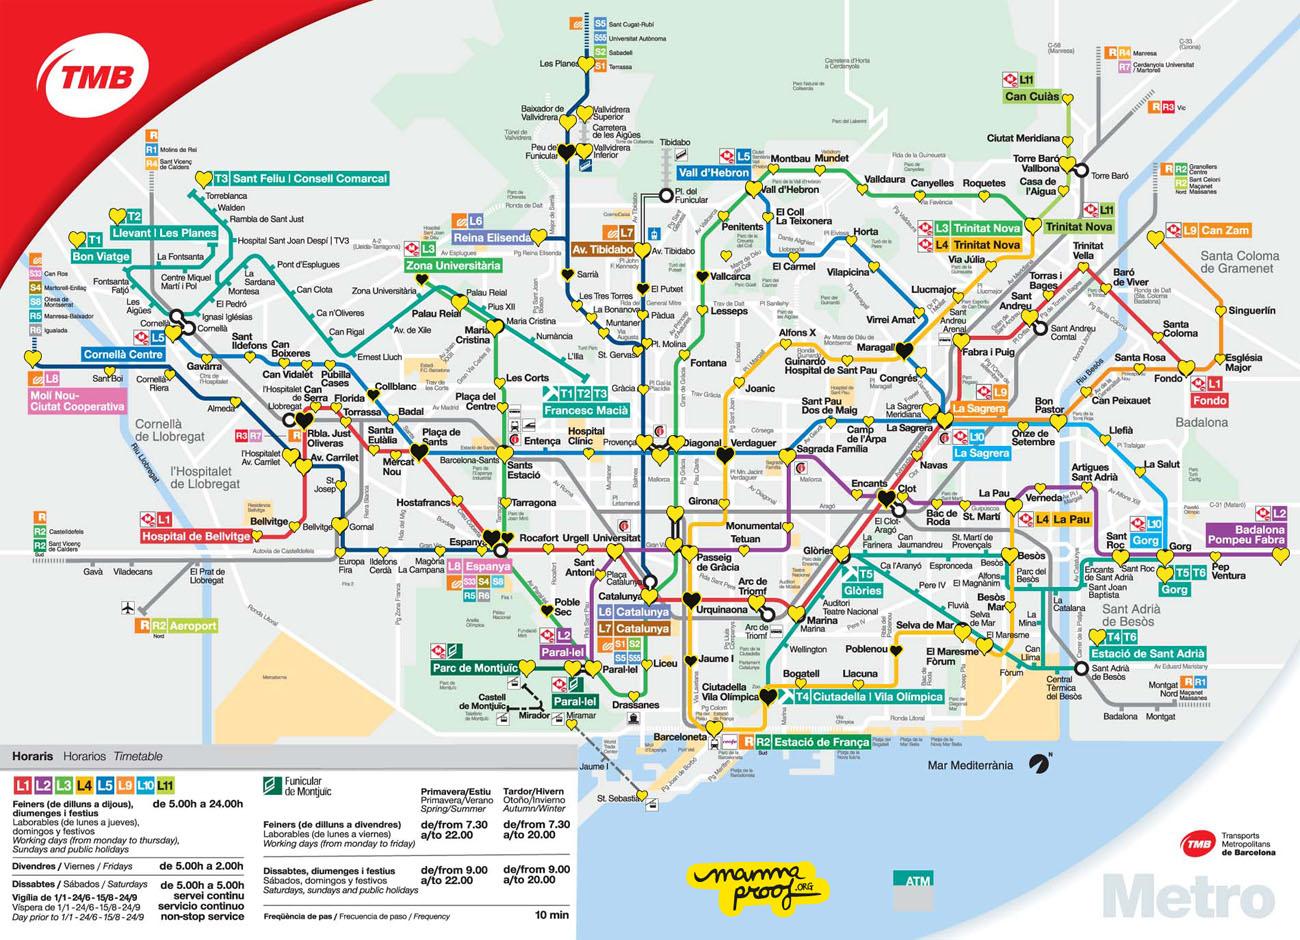 Ascensores En El Metro De Barcelona Mapa Mammaproof